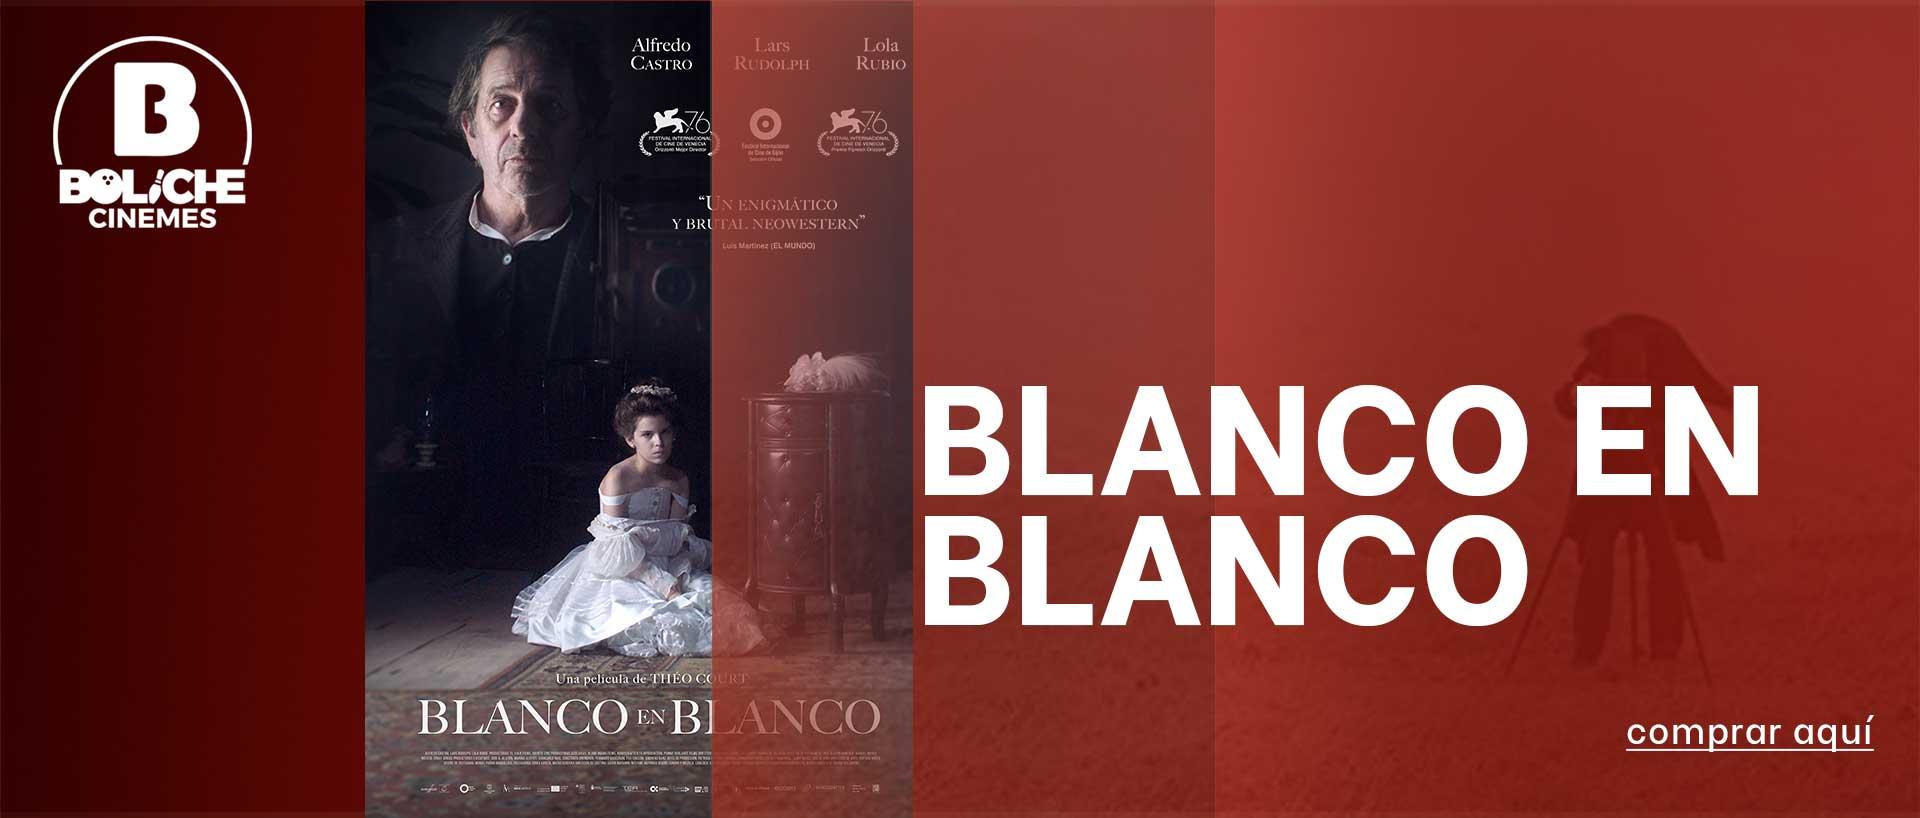 Boliche_Blancoenblanco.jpg